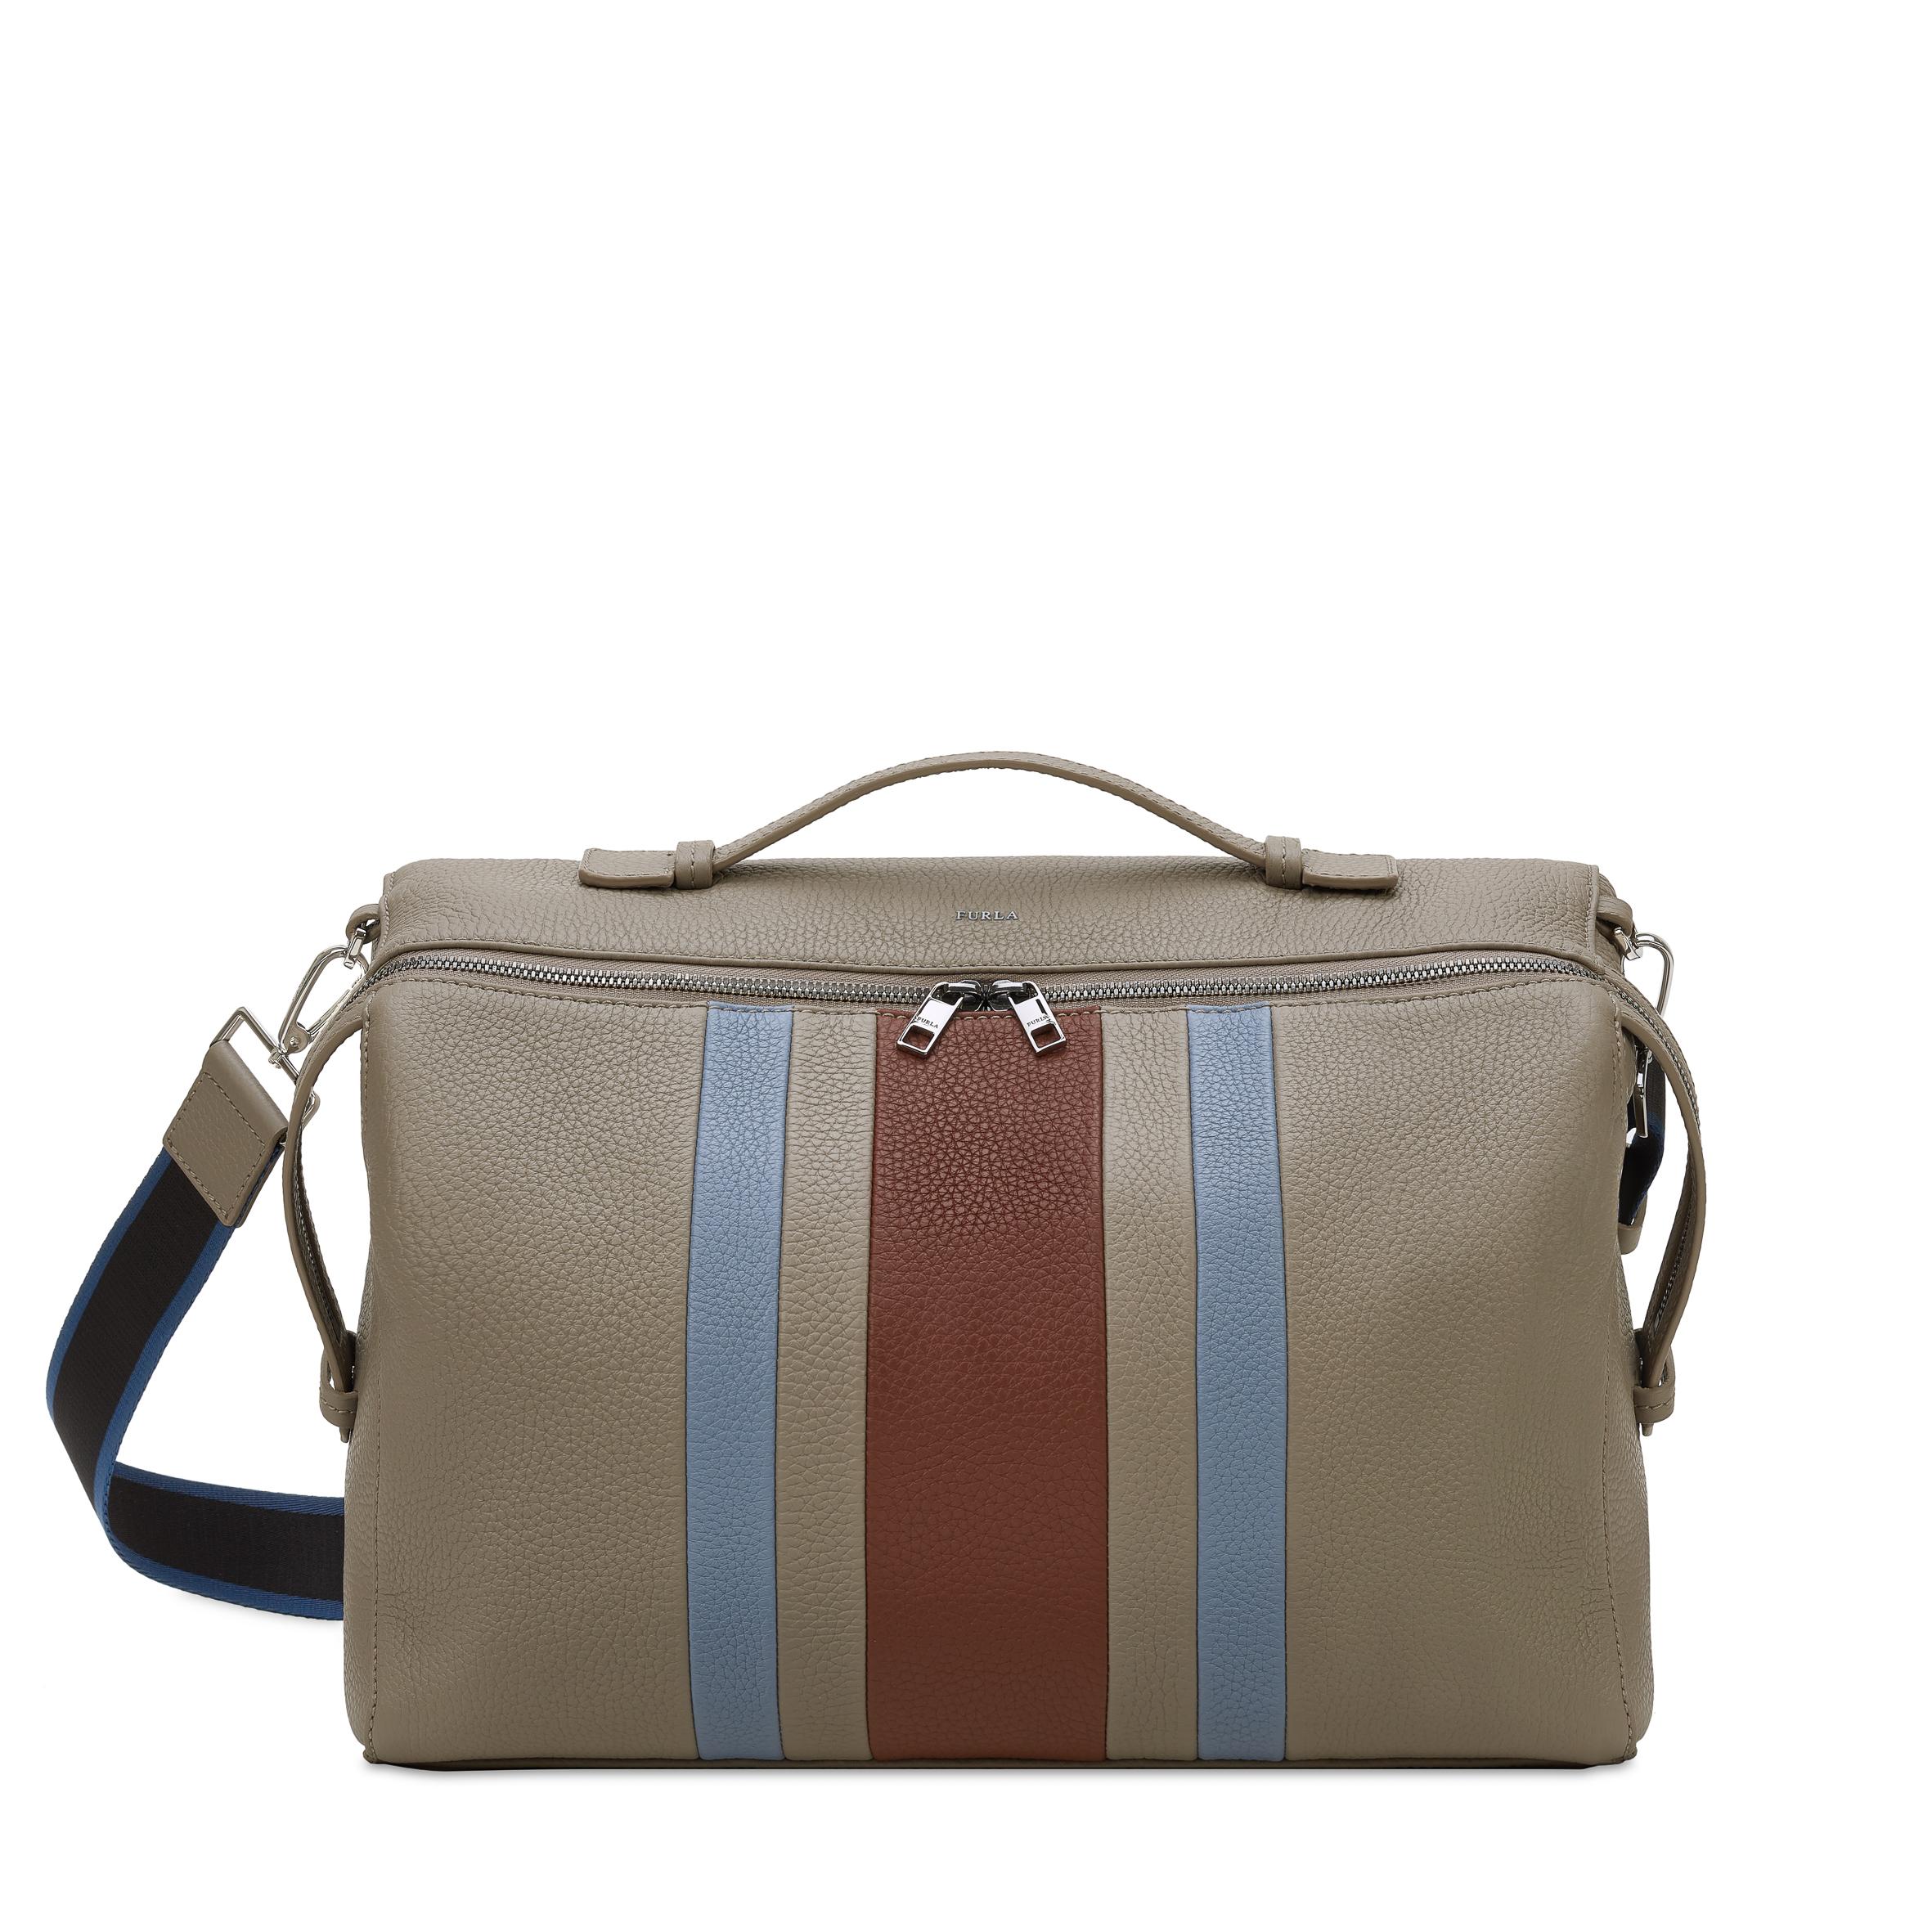 furla, handbag, spring collection, venice, italy, fashion, ssi